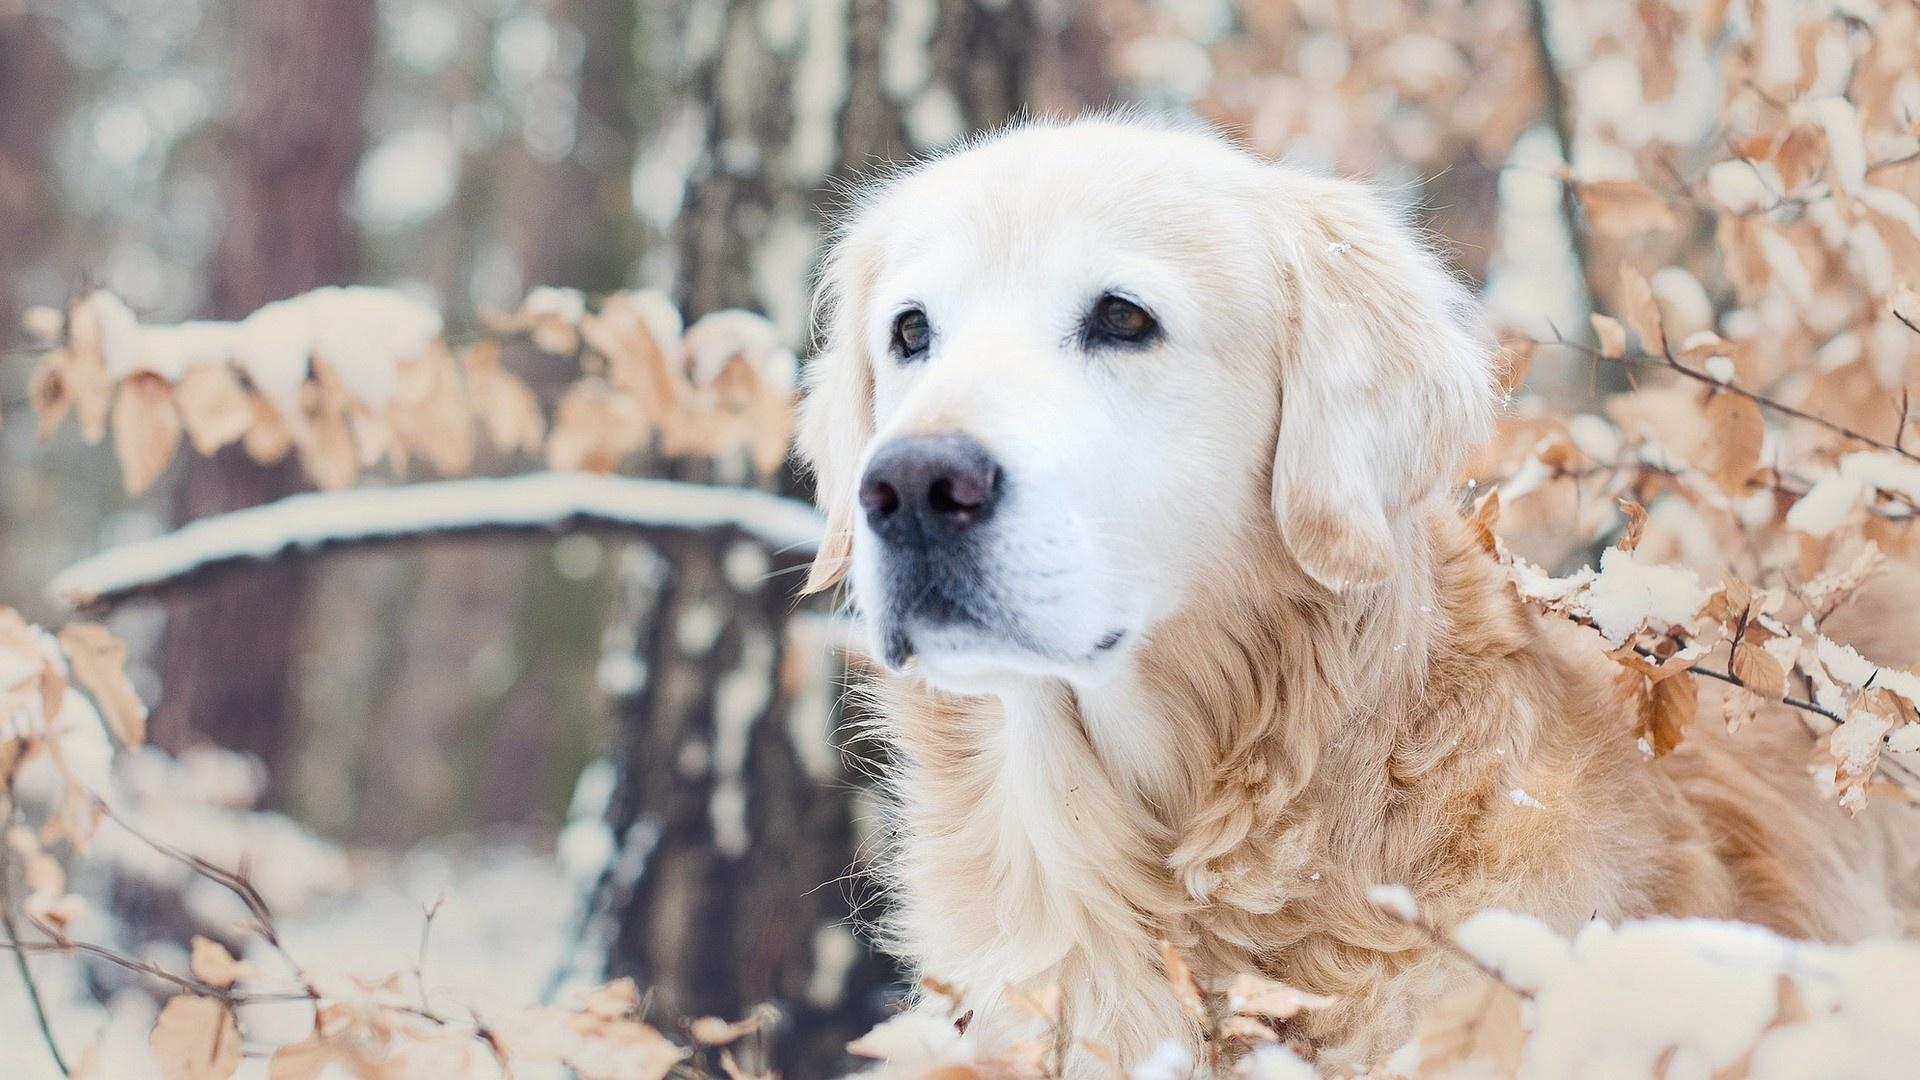 Wallpaper dog, muzzle, snow, winter, forest desktop wallpaper ...